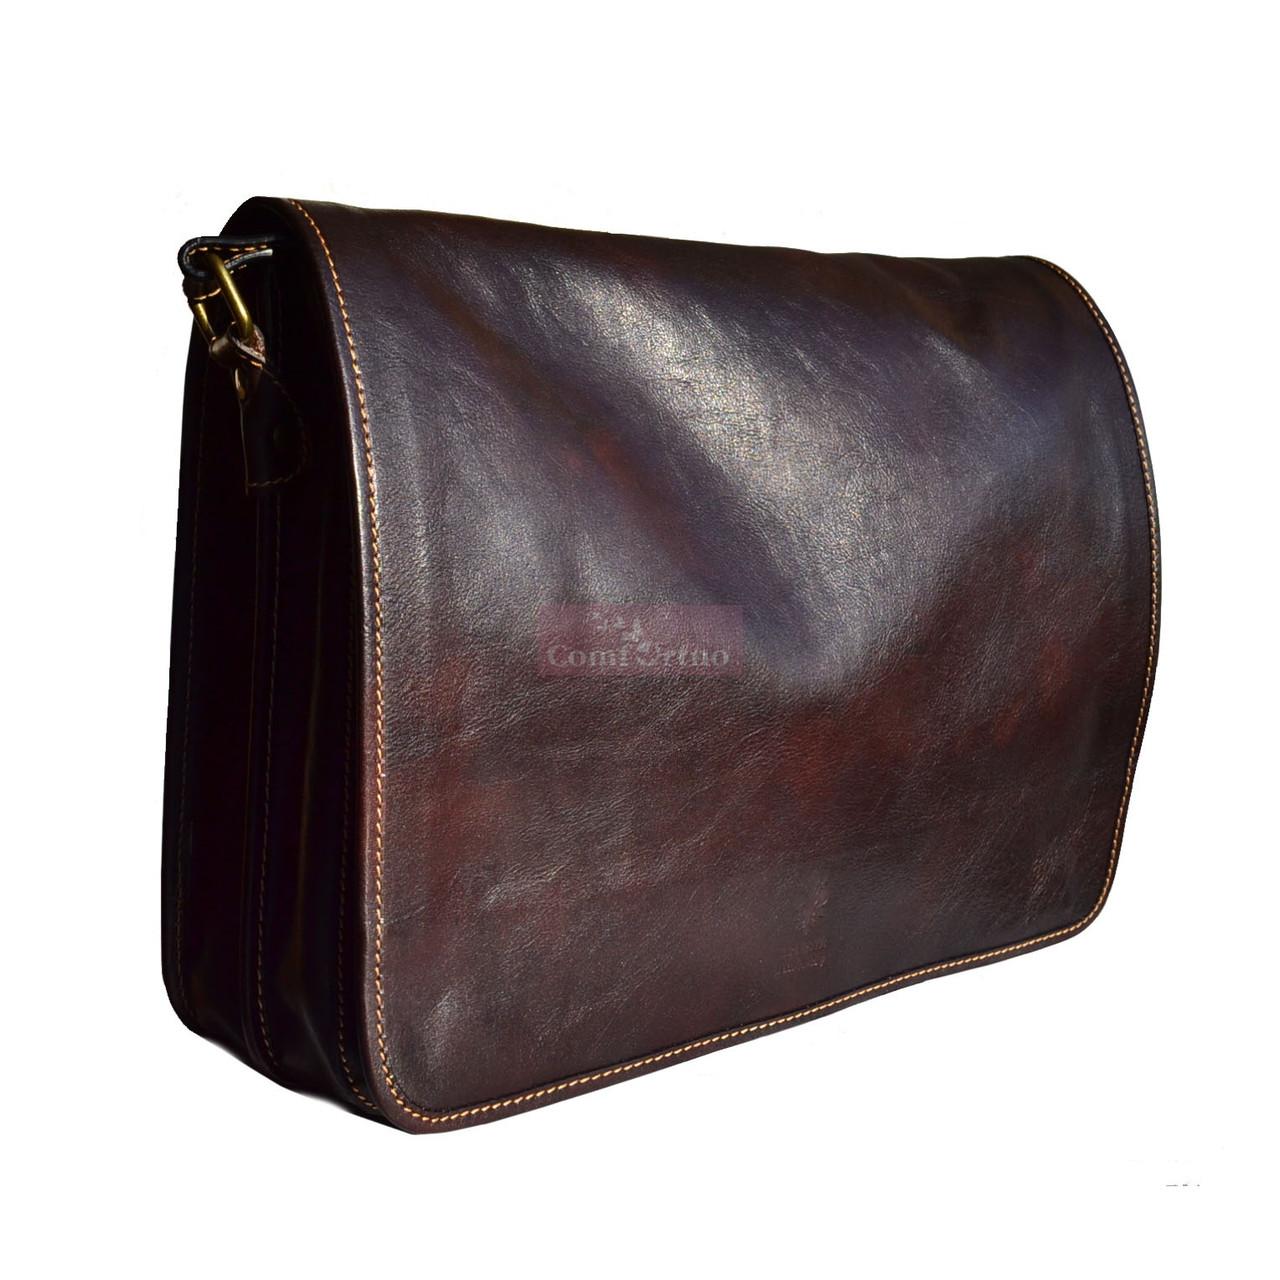 0be4e508ea9a Мужская кожаная сумка-мессенджер Italian fabric bags 1034 -  Интернет-магазин товаров для дома